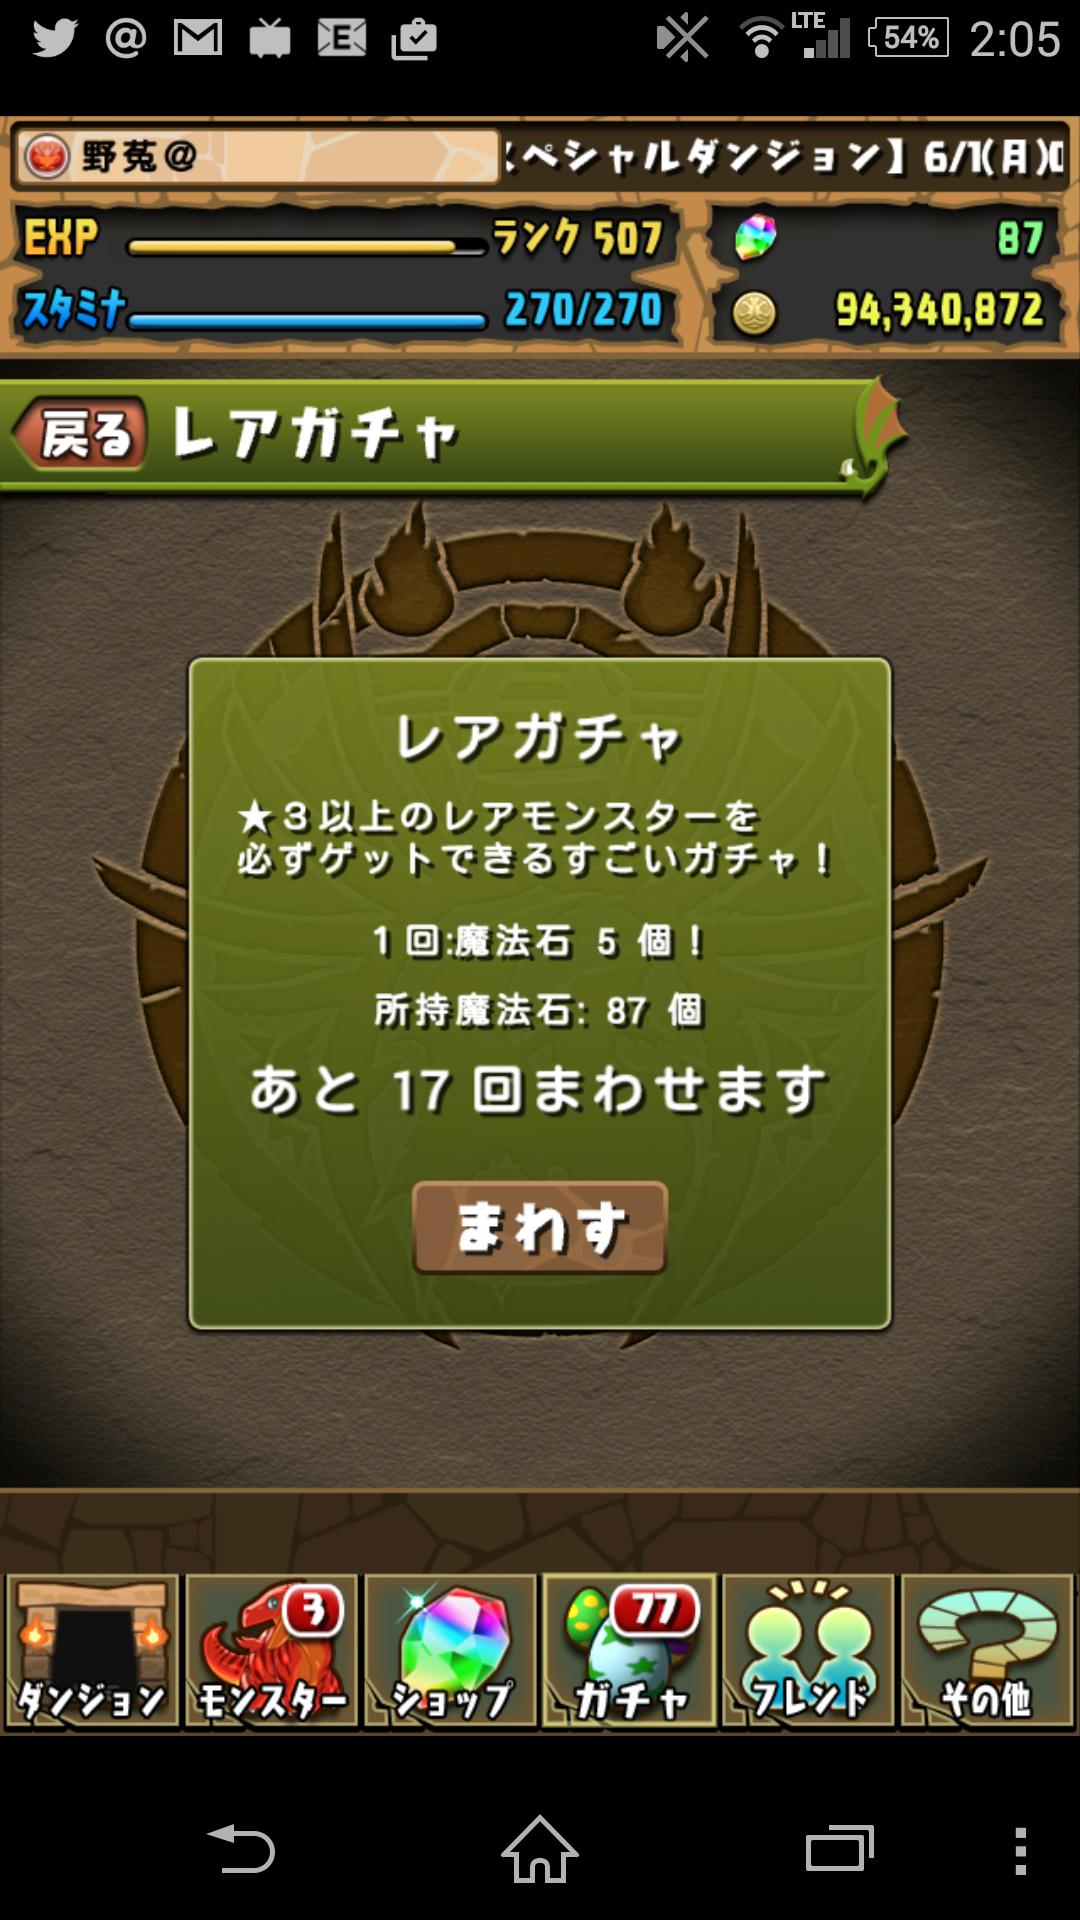 Screenshot_2015-06-14-02-05-28.png